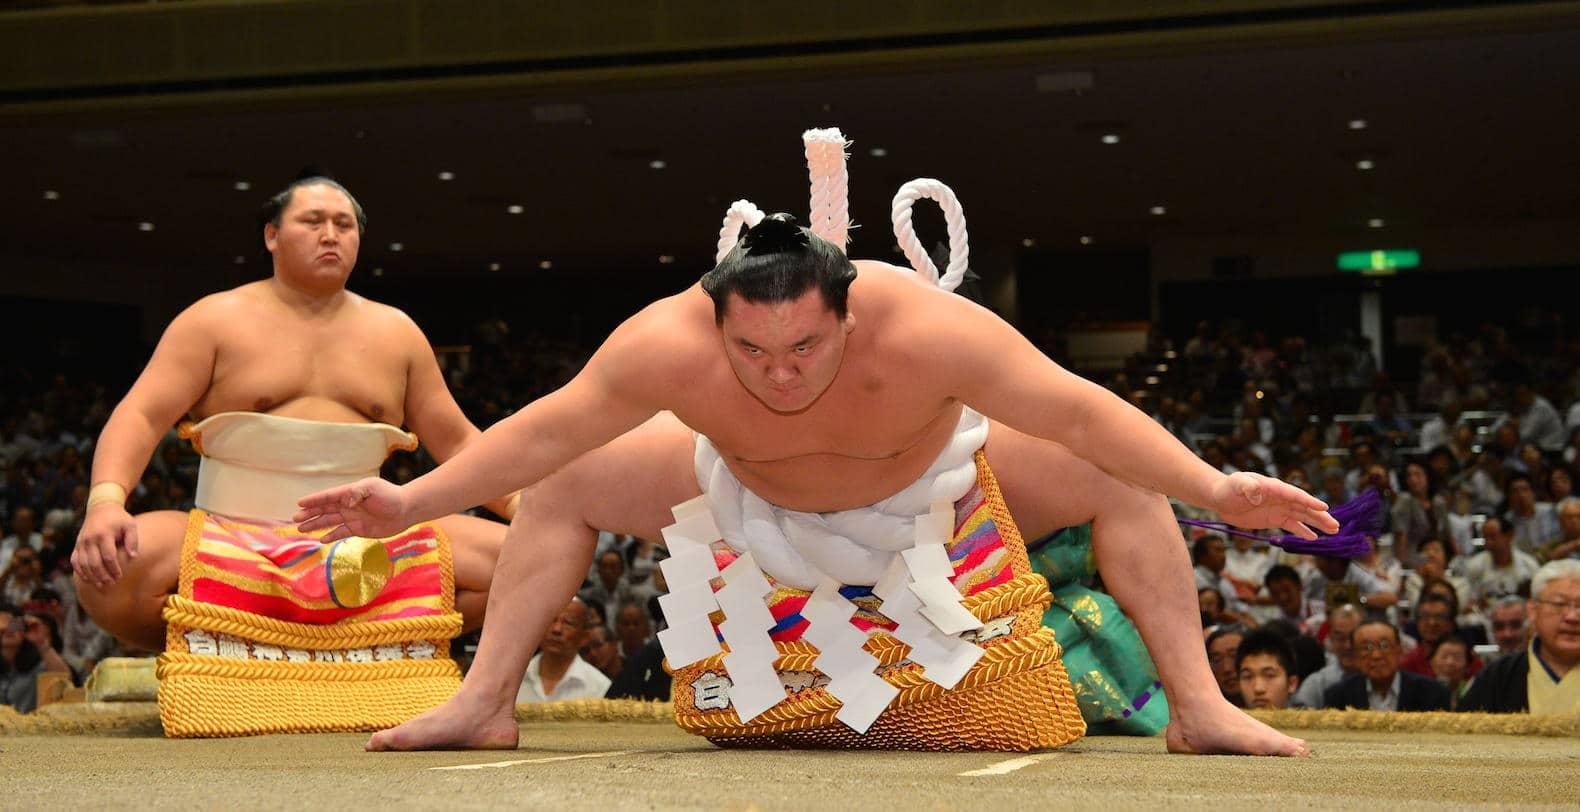 Sumo Wrestling |Grappling Tokyo